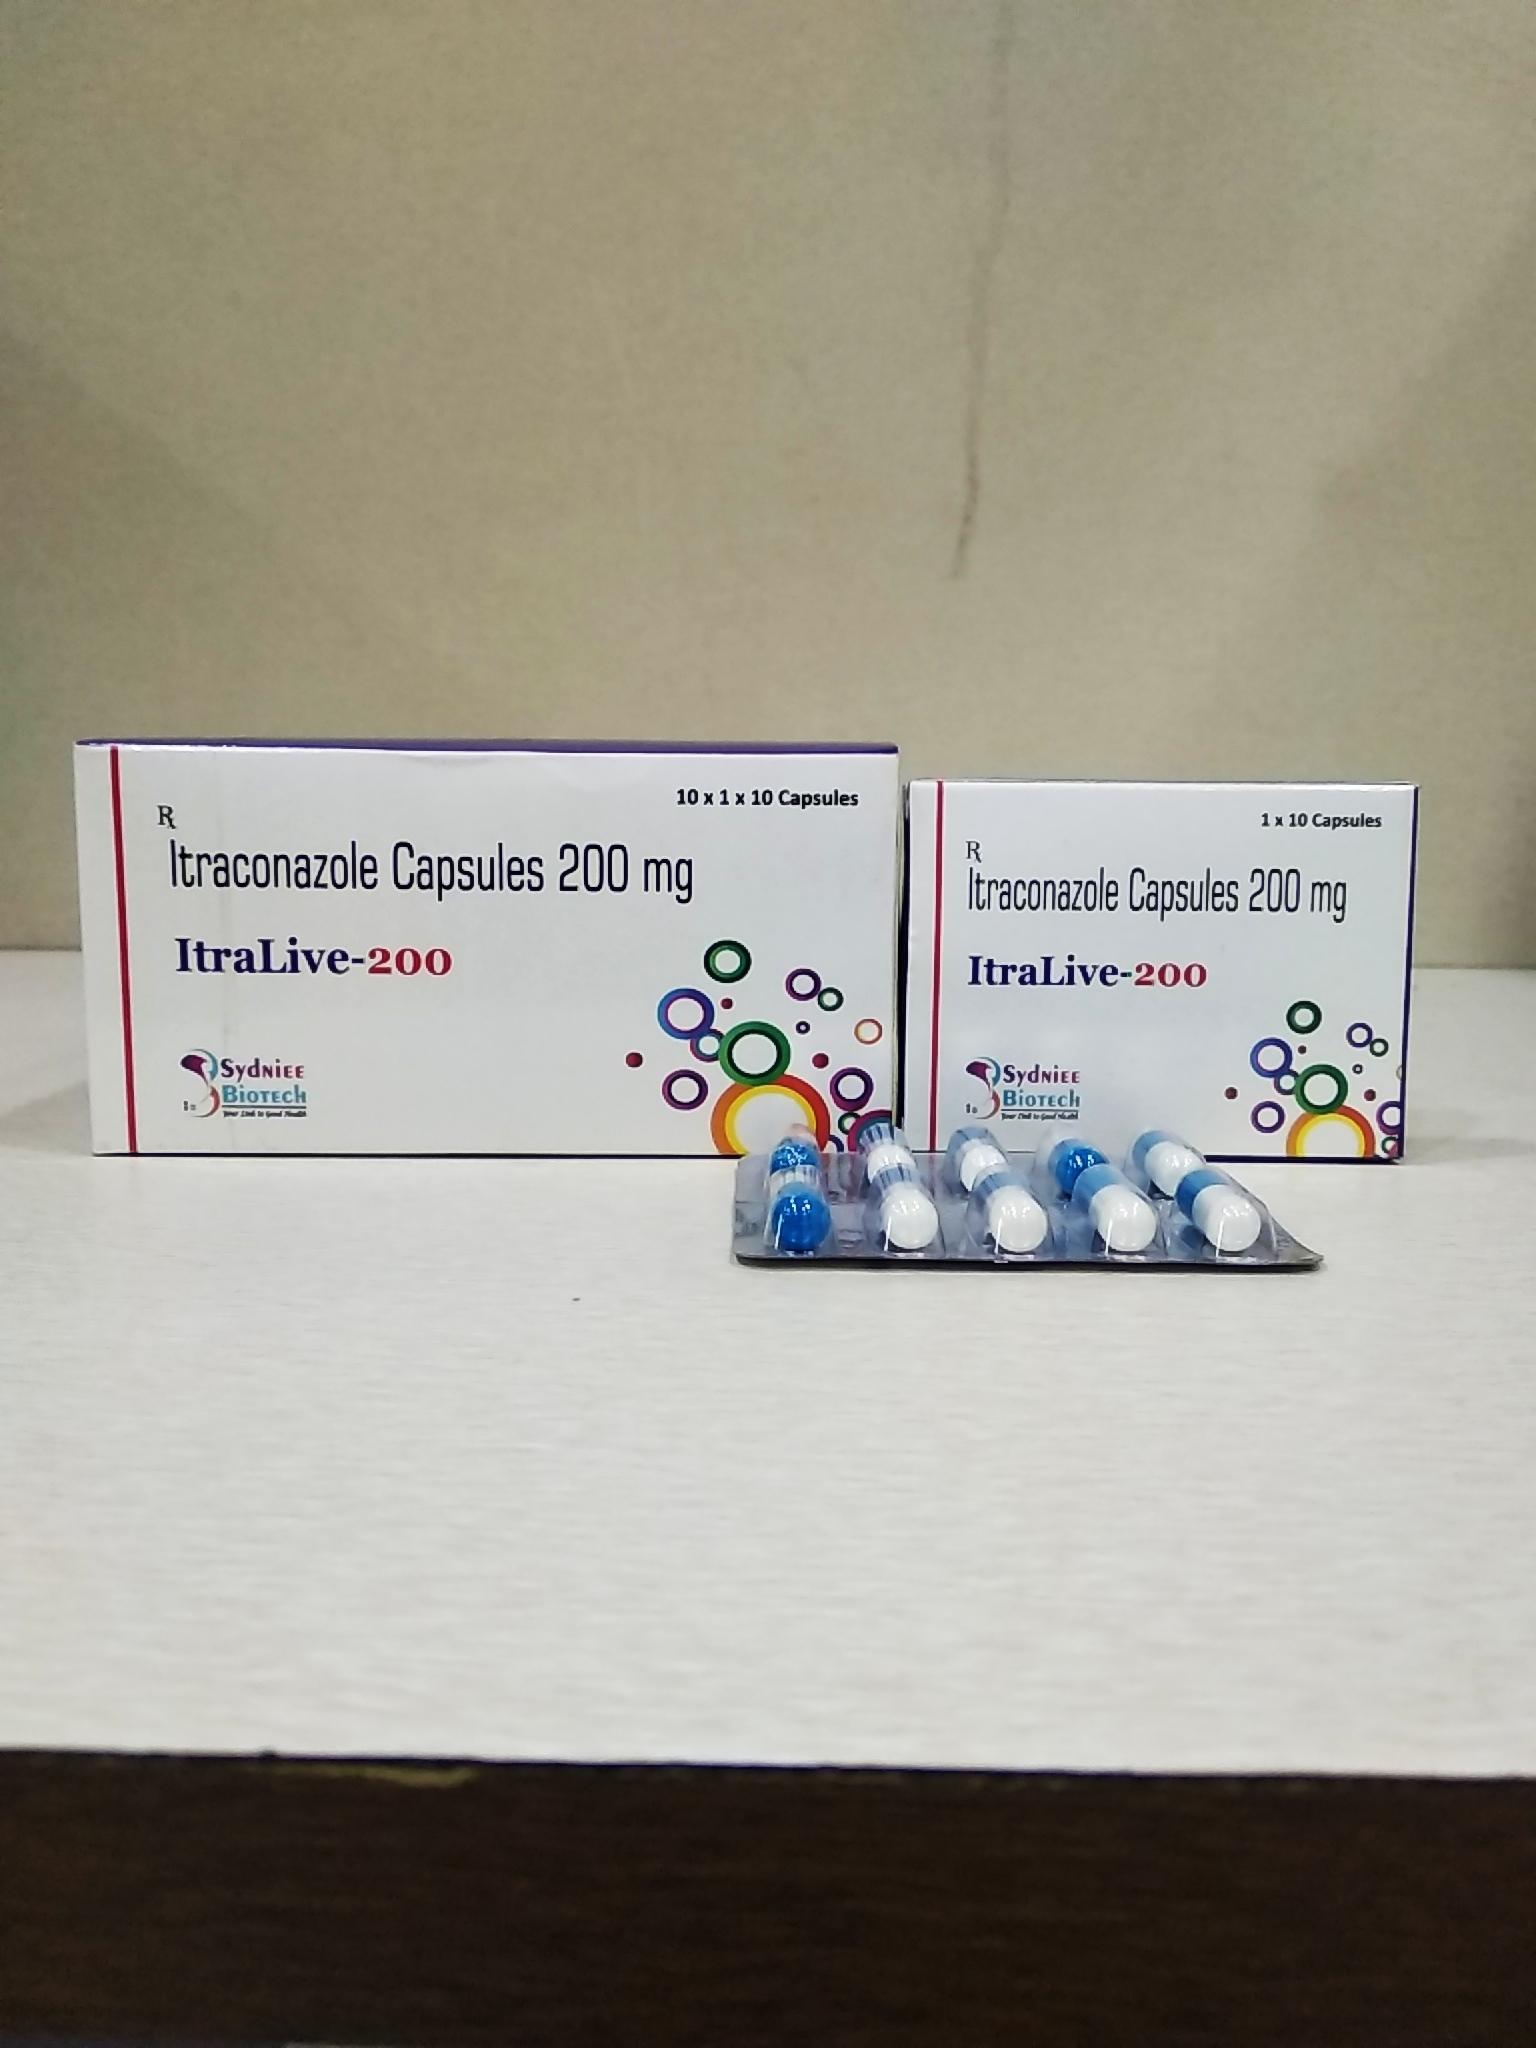 Itraconazole capsule